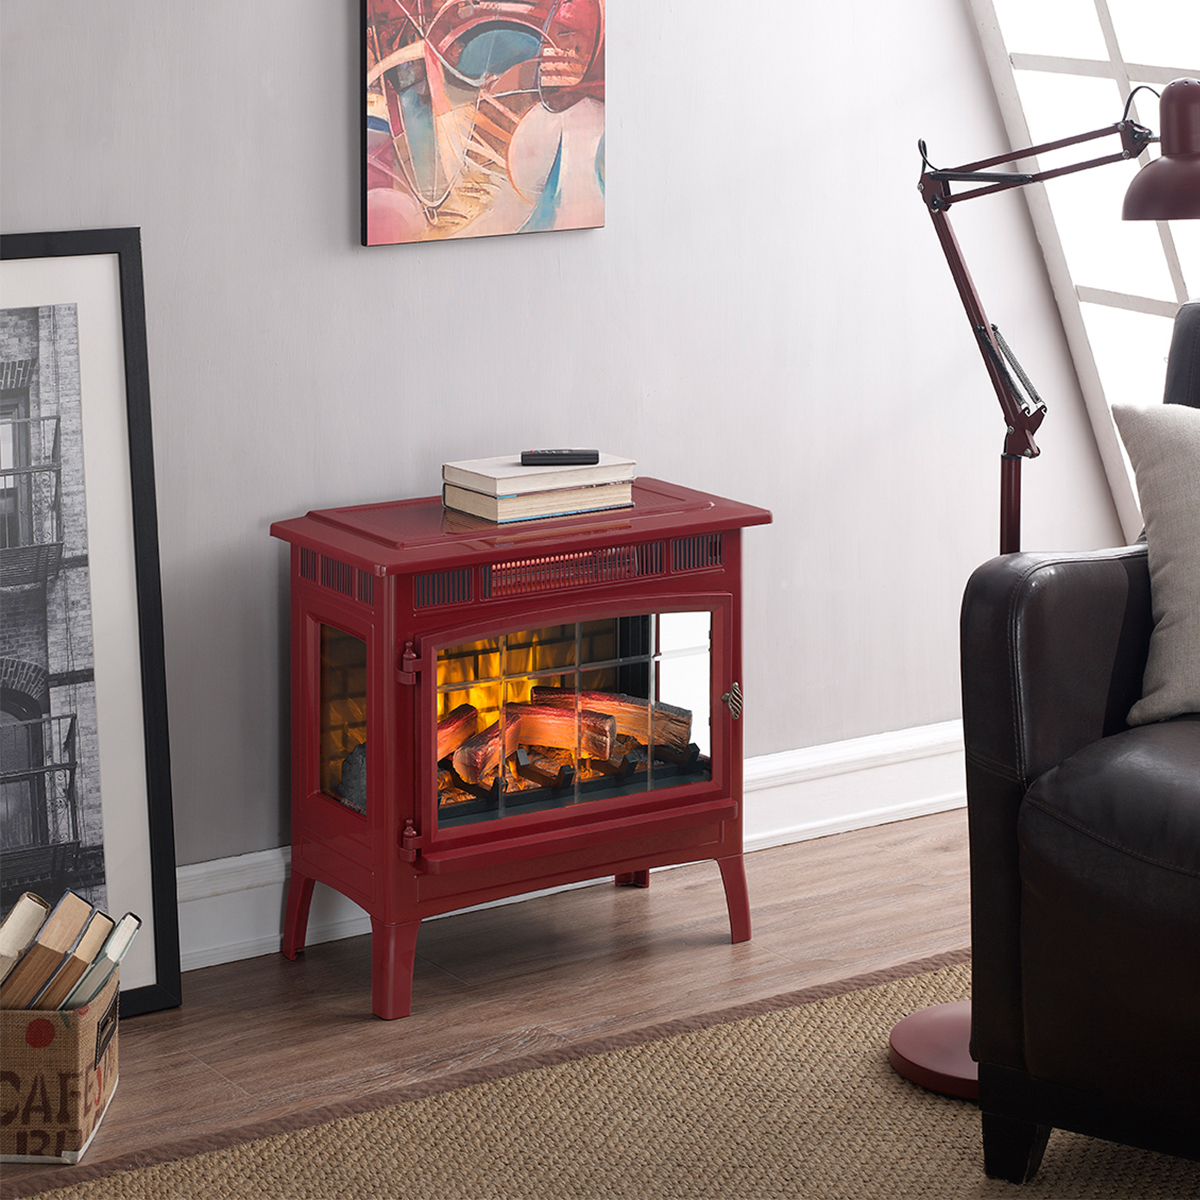 Twinstar石英管紅外線電暖爐